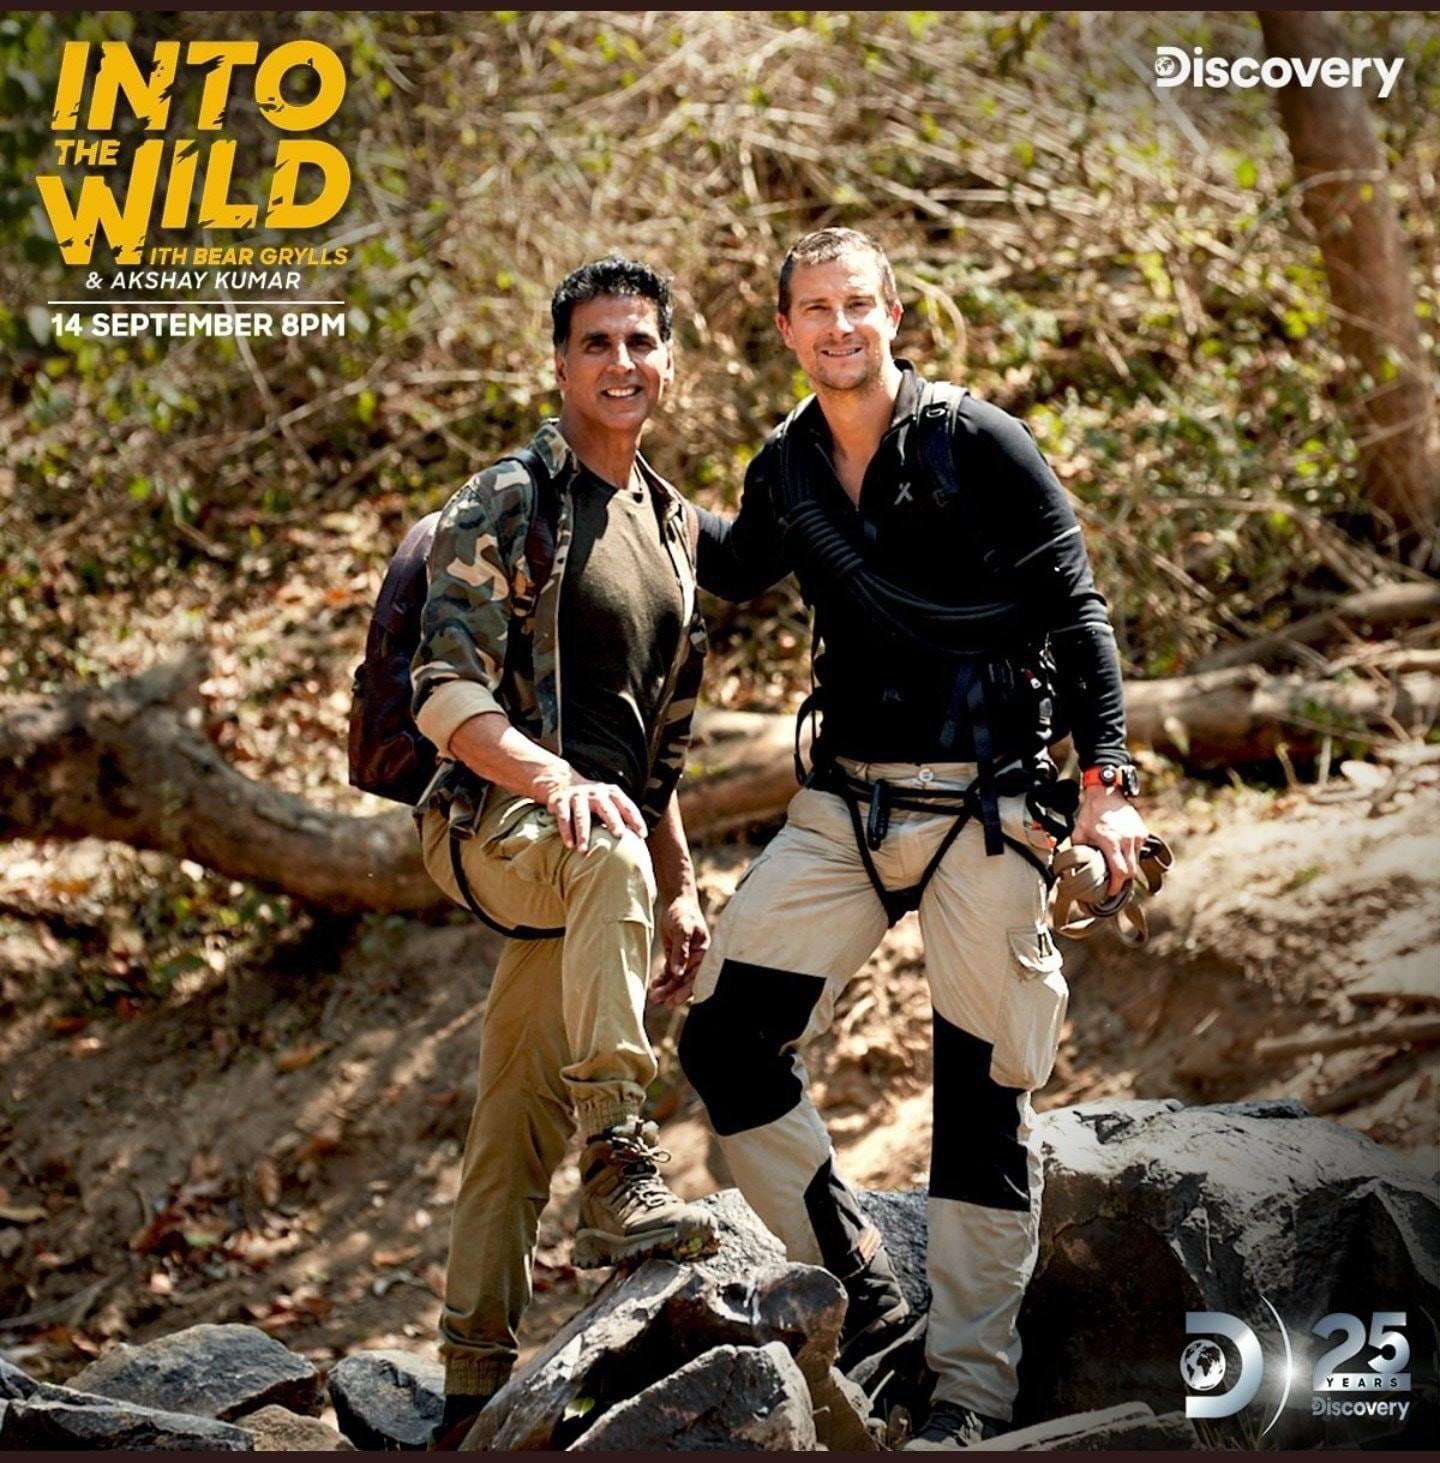 Into The Wild with Bear Grylls & Akshay Kumar (2020) S01E01 Hindi Malti Audio 720p HDRip ESubs 1.6GB | 250MB Download